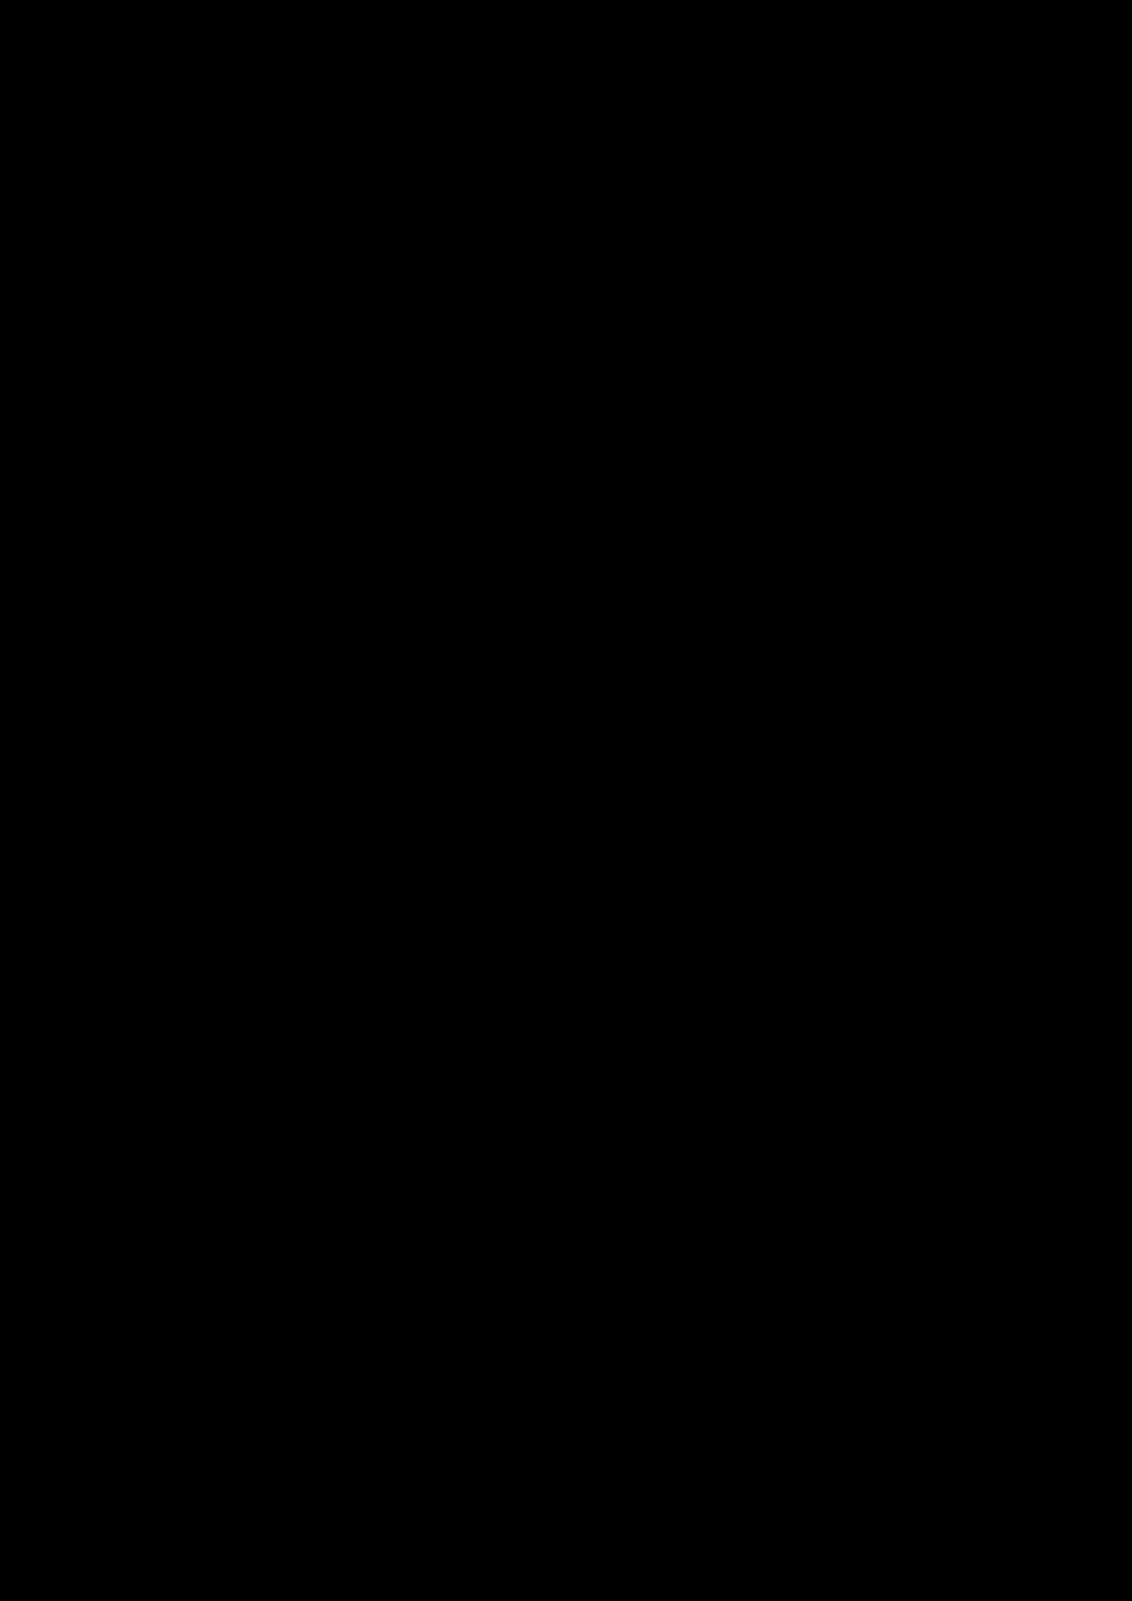 Prosti slide, Image 34